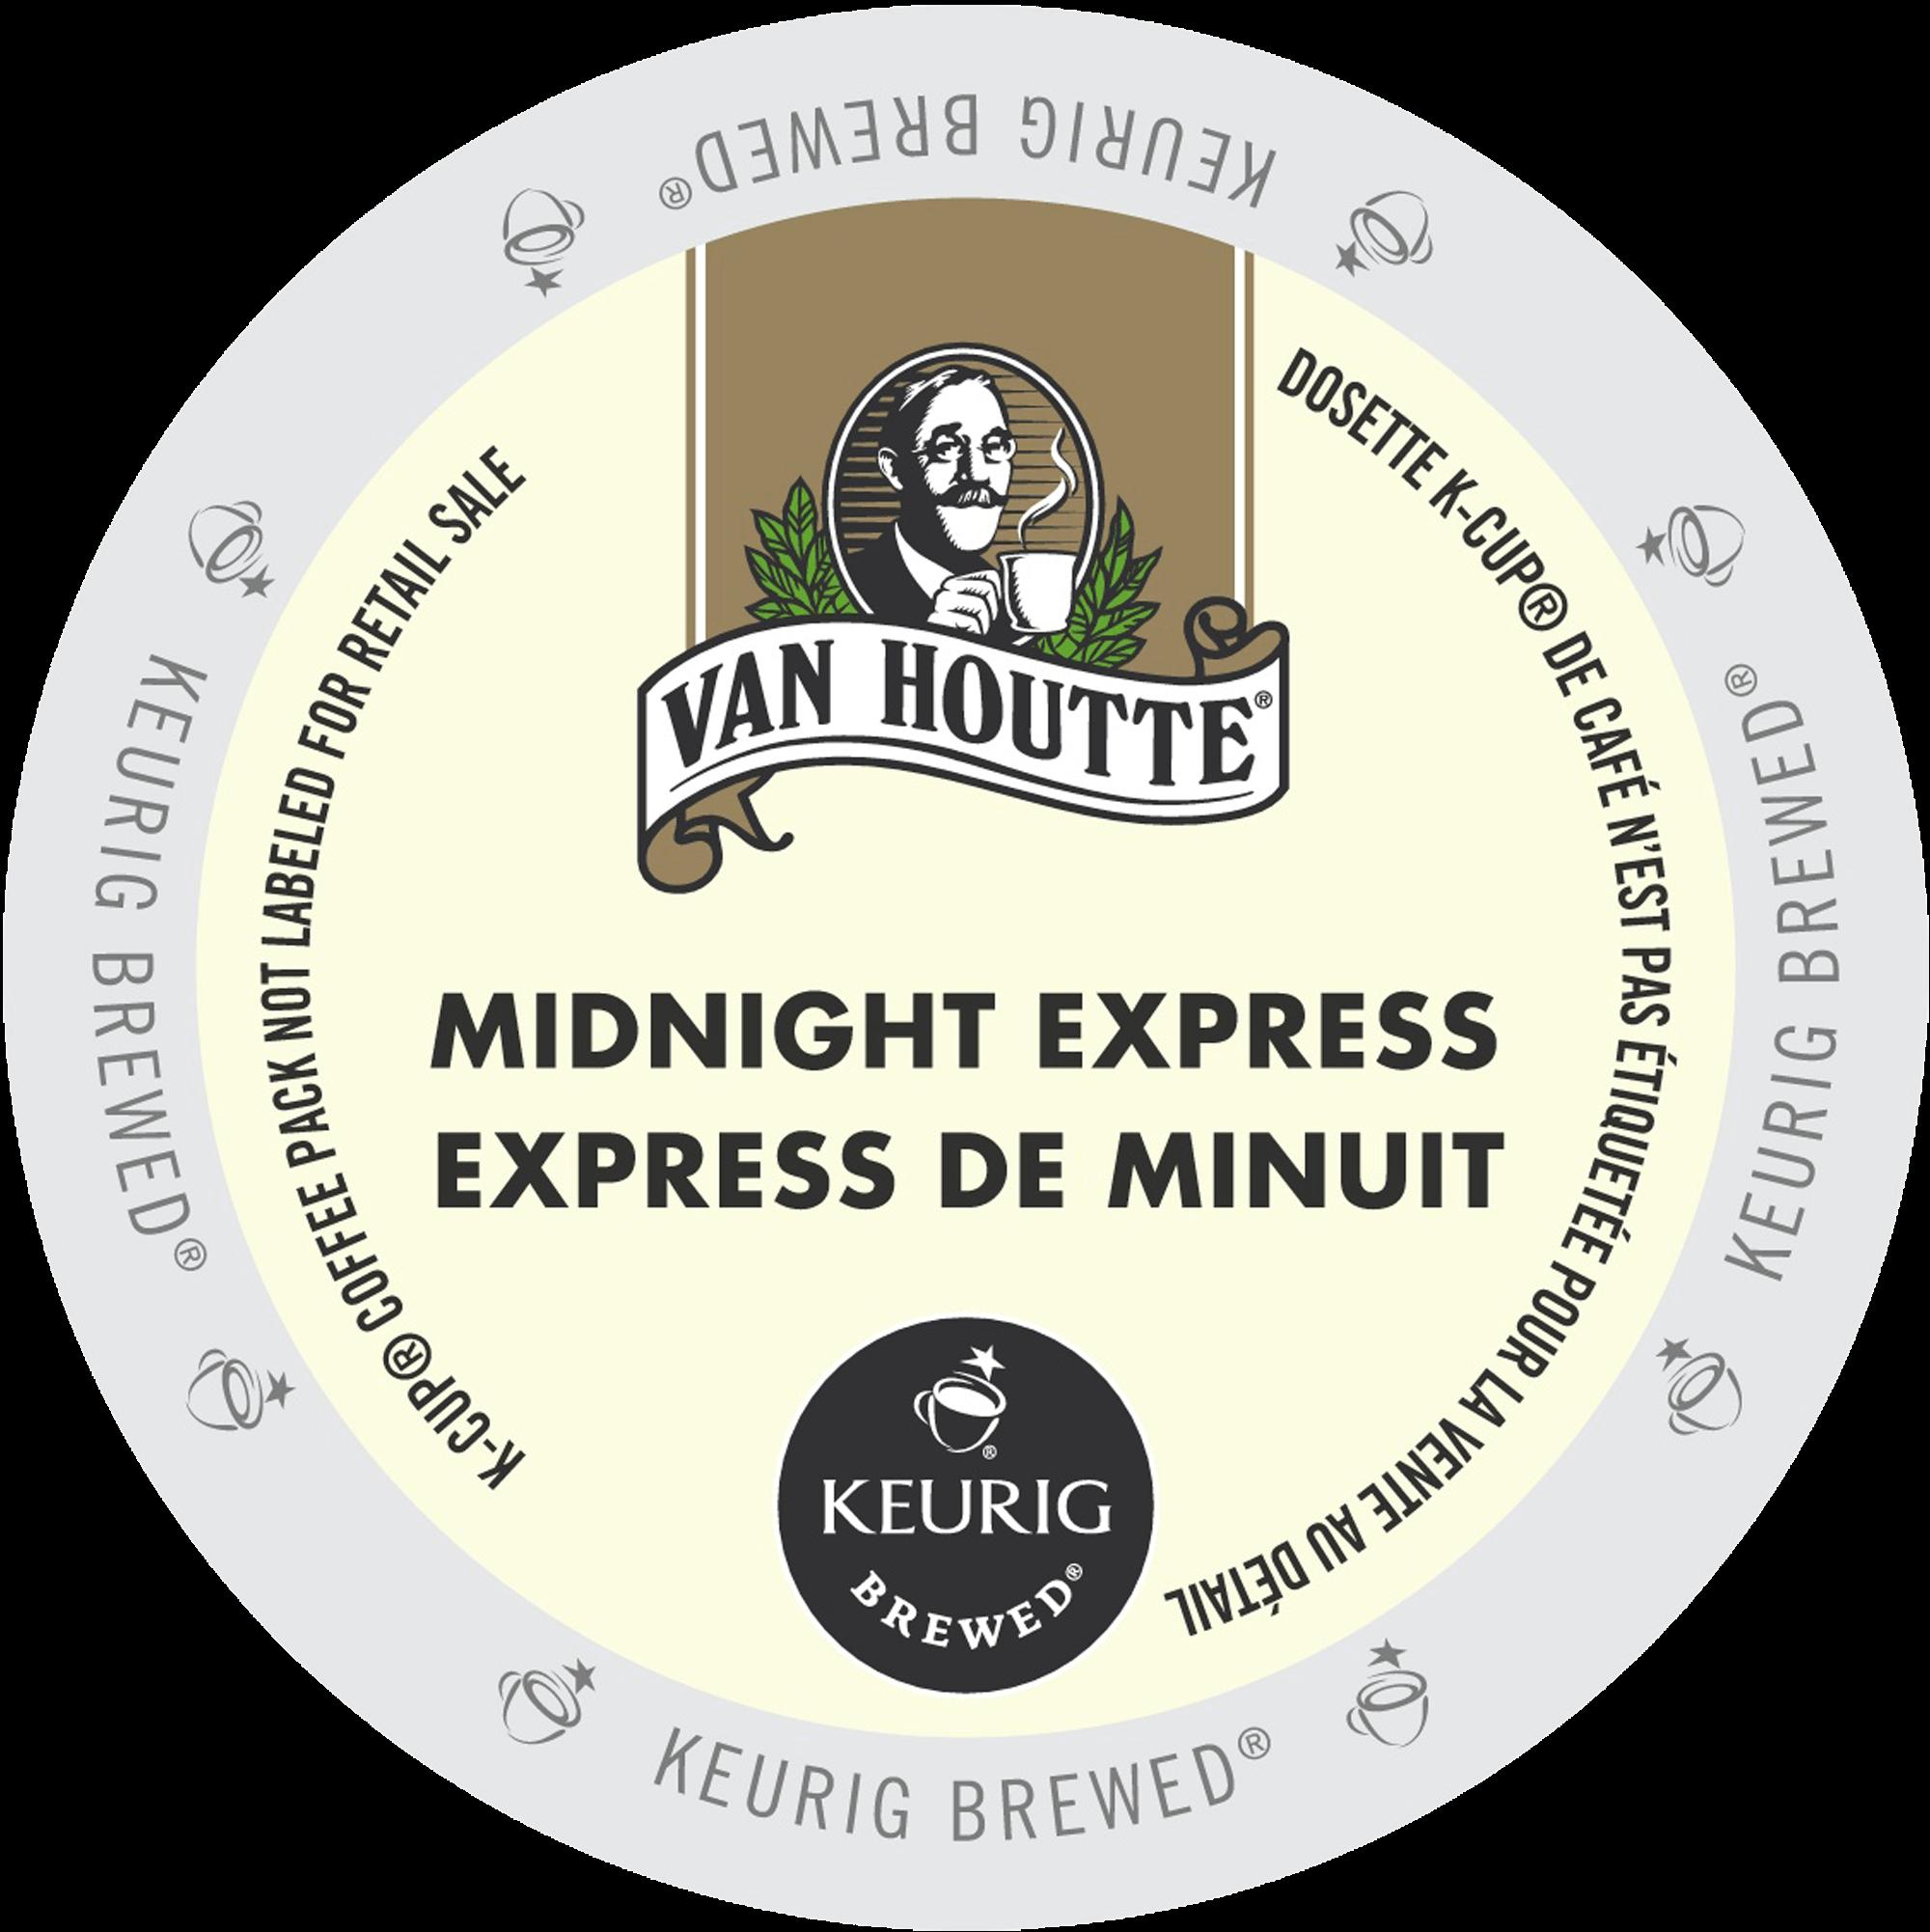 midnight-express-coffee-van-houtte-k-cup_ca_general